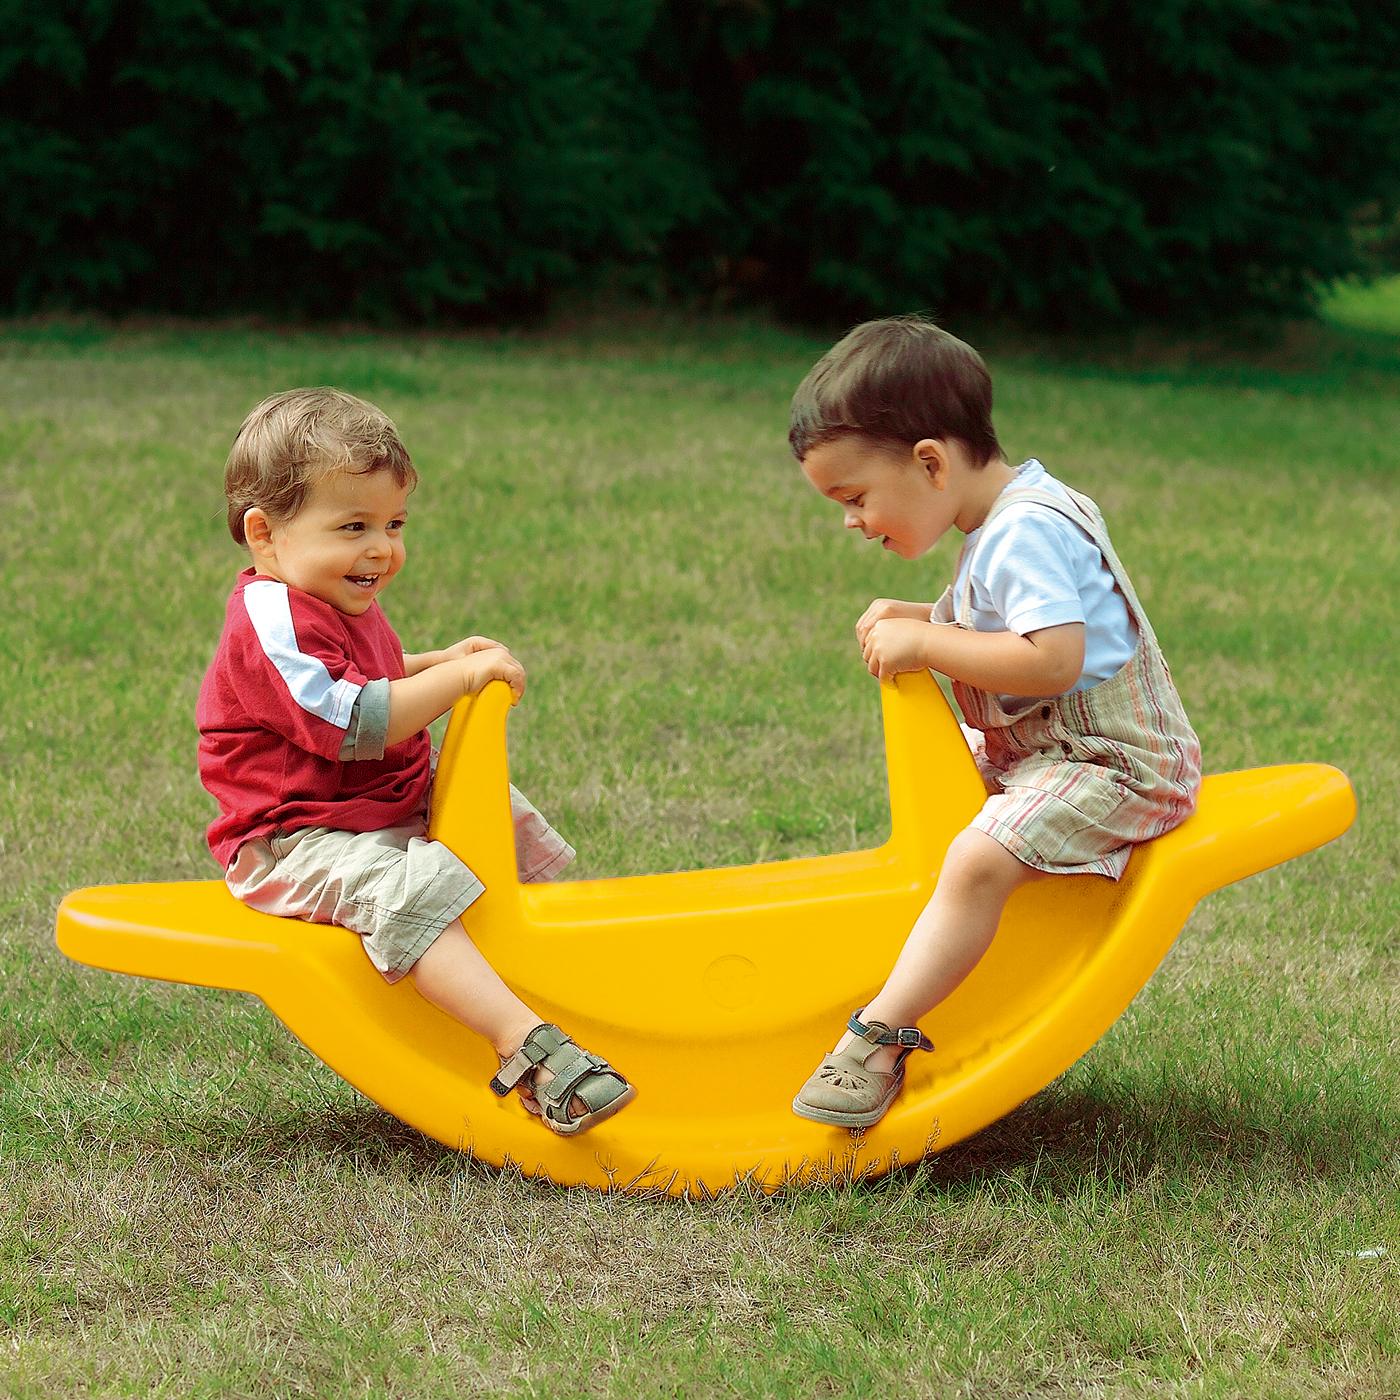 3 seater Rocker - Seesaw - daycare playground equipment - Excellent4KidsExcellent4Kids